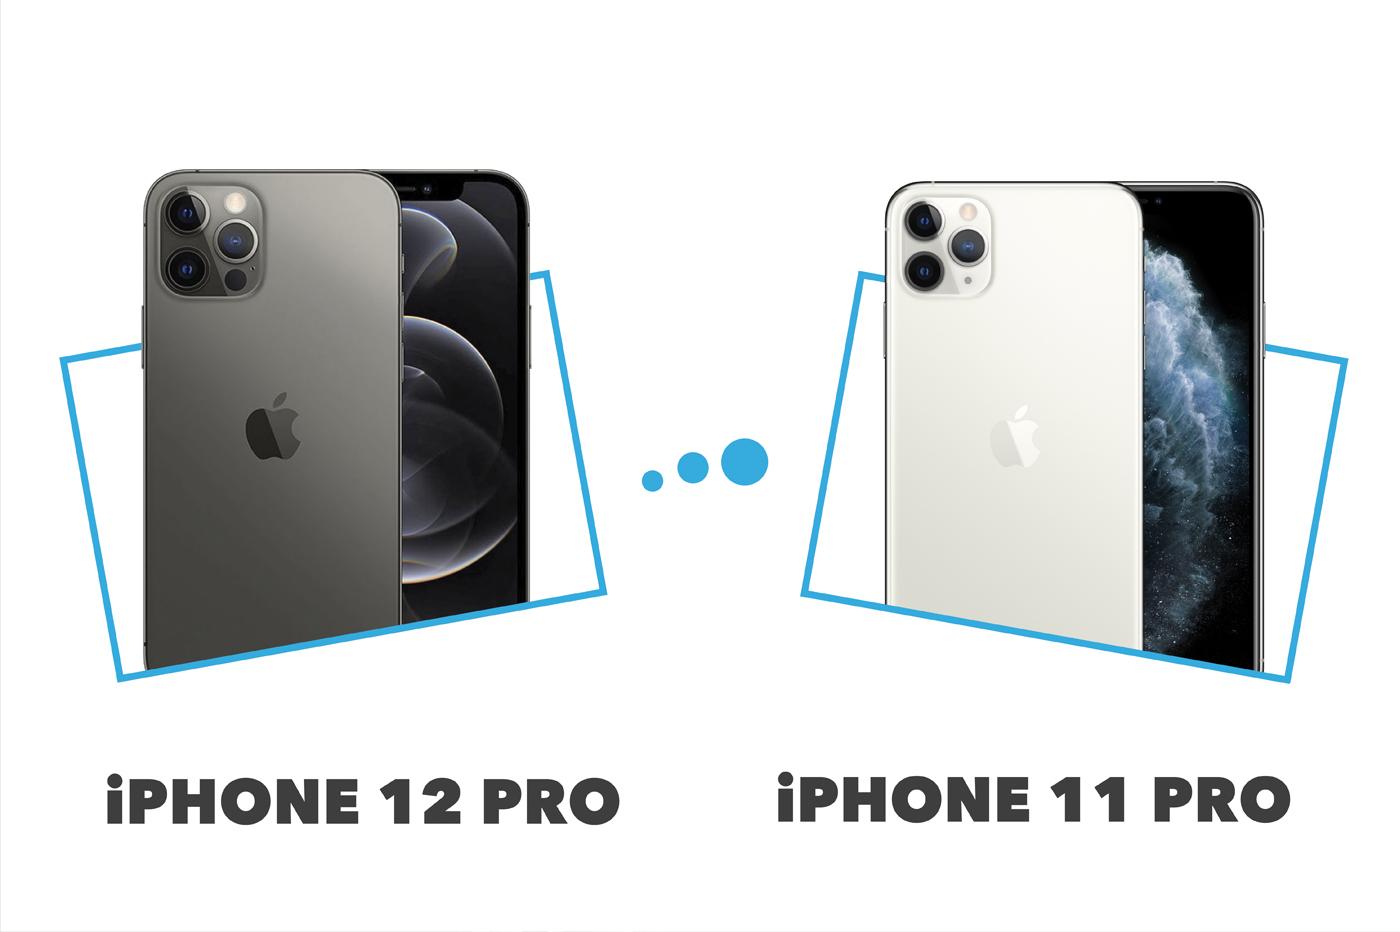 Comparatif iPhone 12 Pro vs iPhone 11 Pro